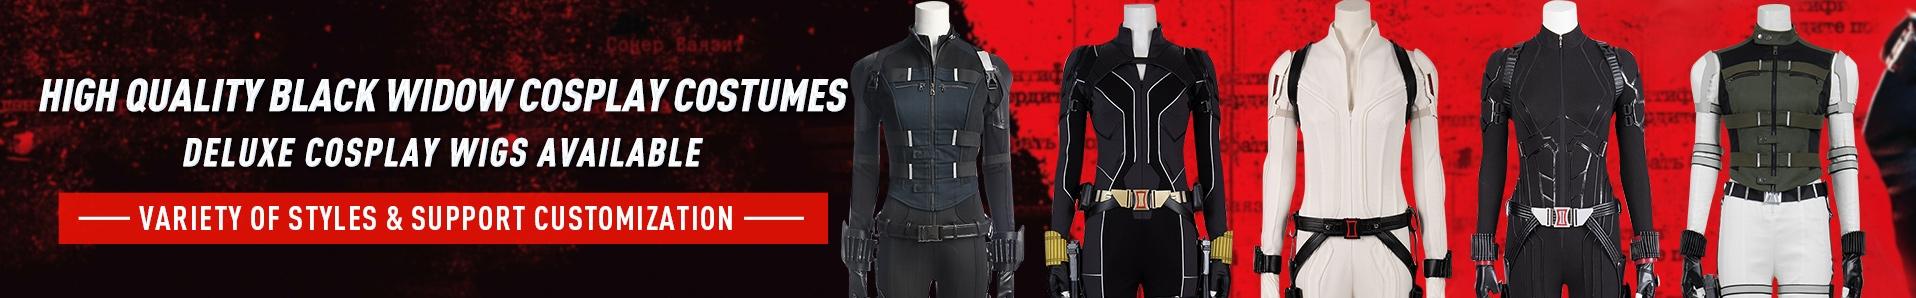 Black Widow cosplay costumes